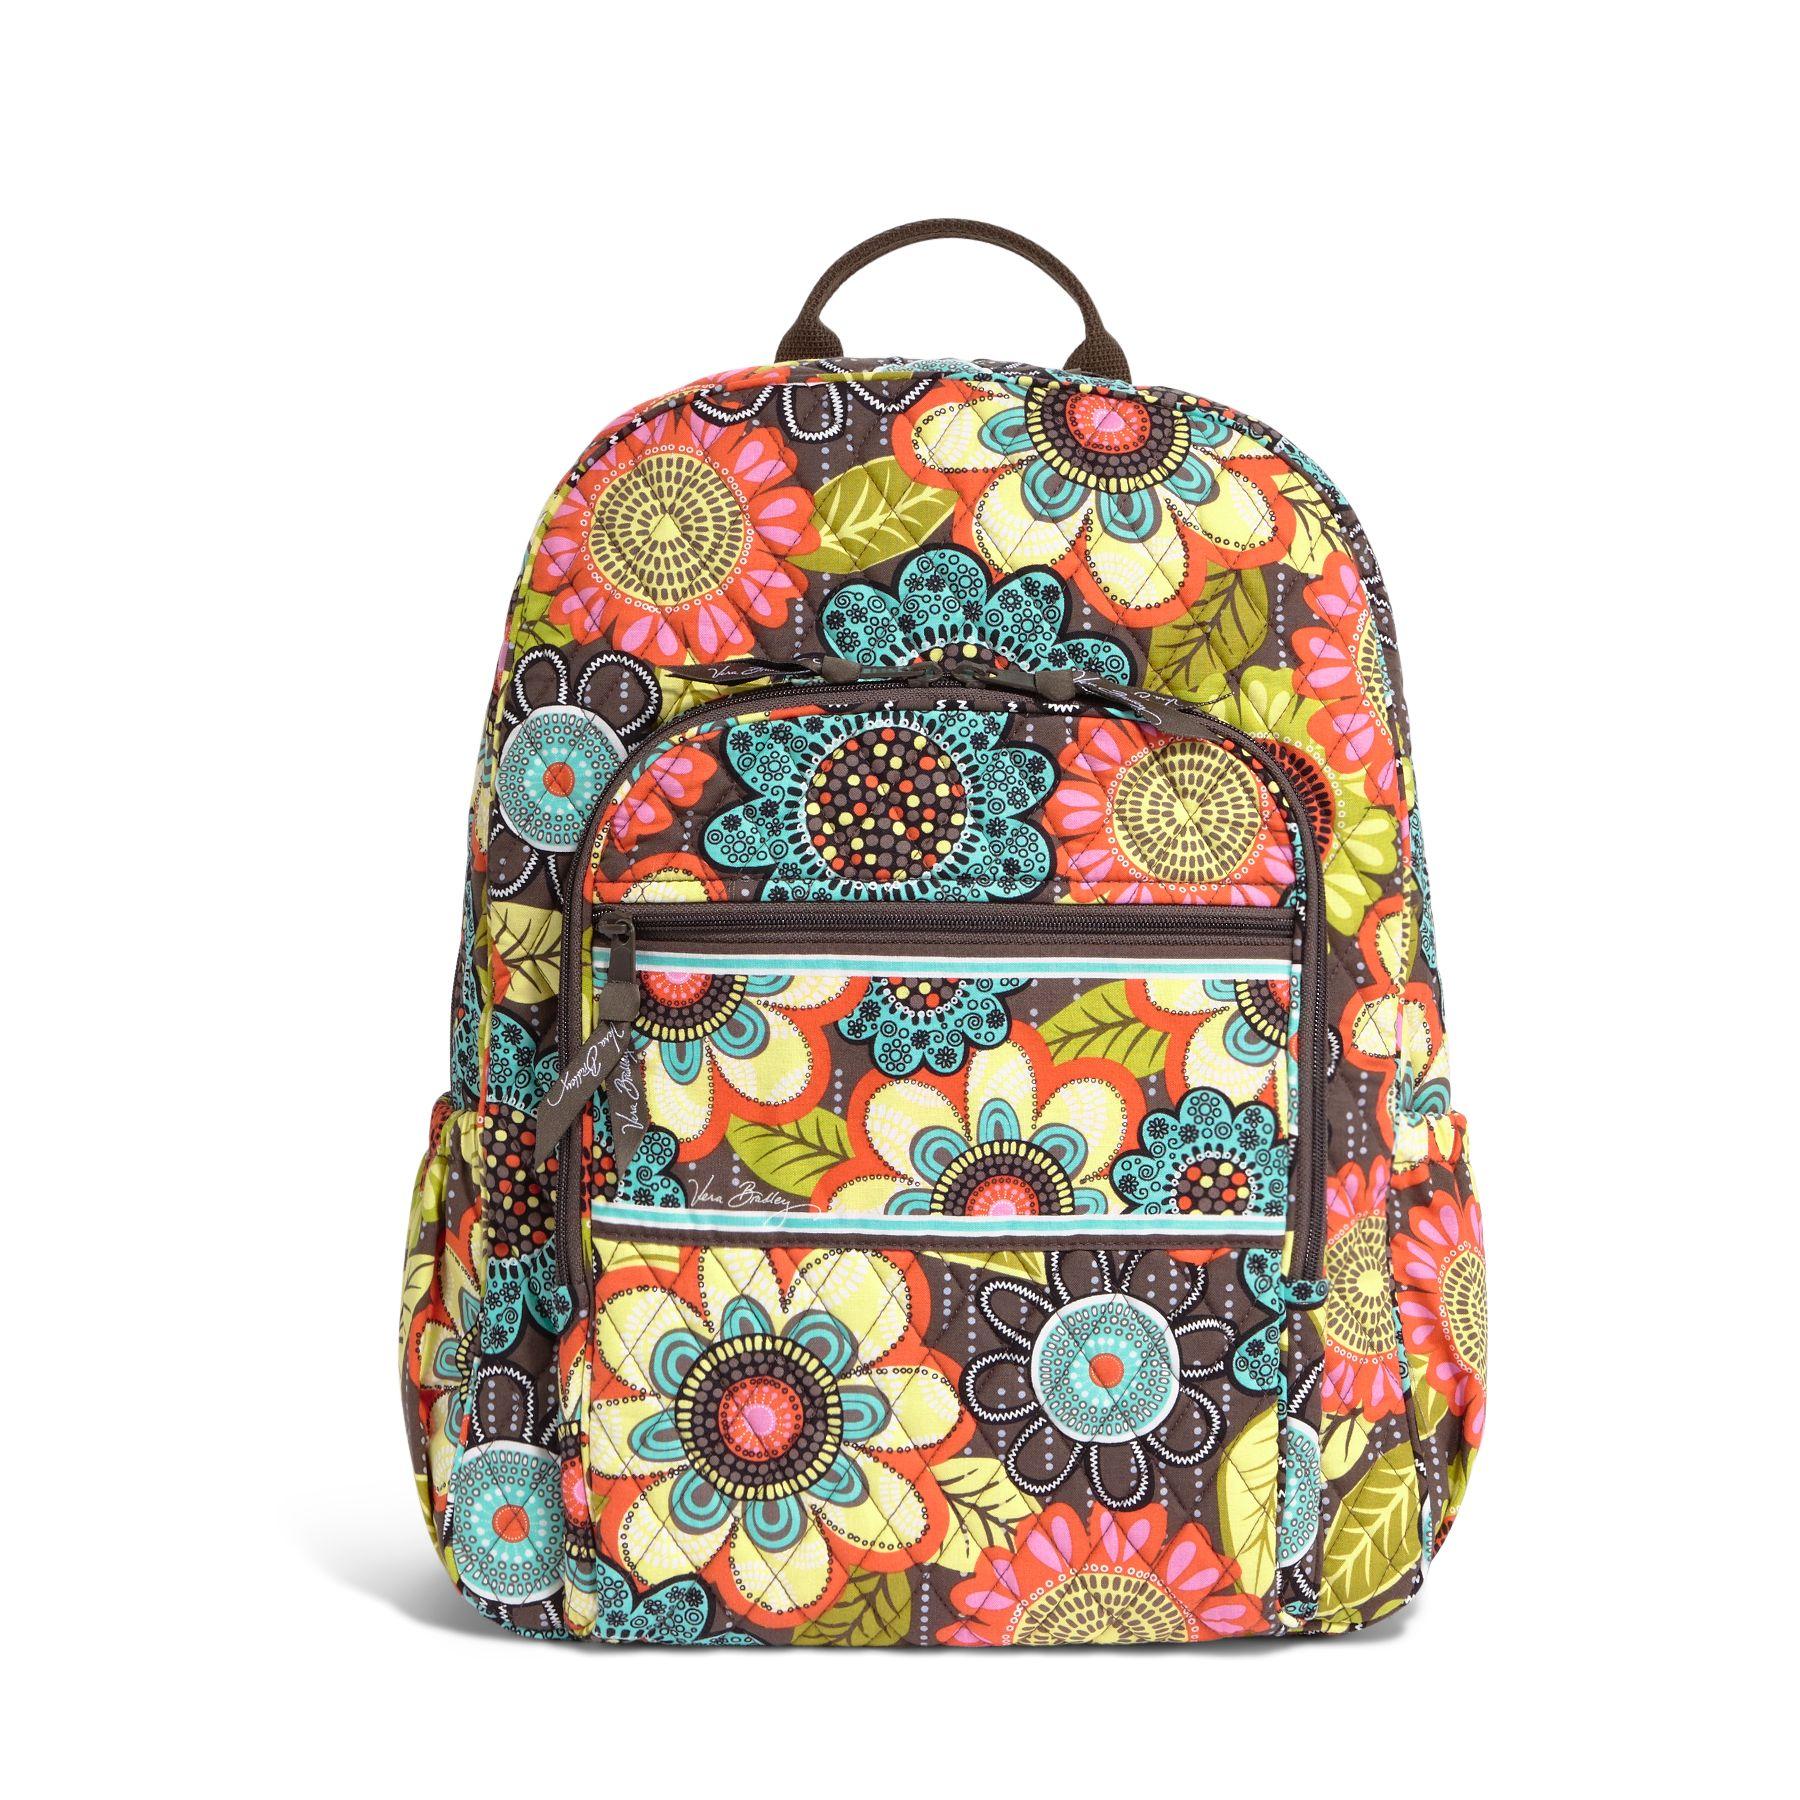 Vera Bradley Campus Backpack in Flower Shower